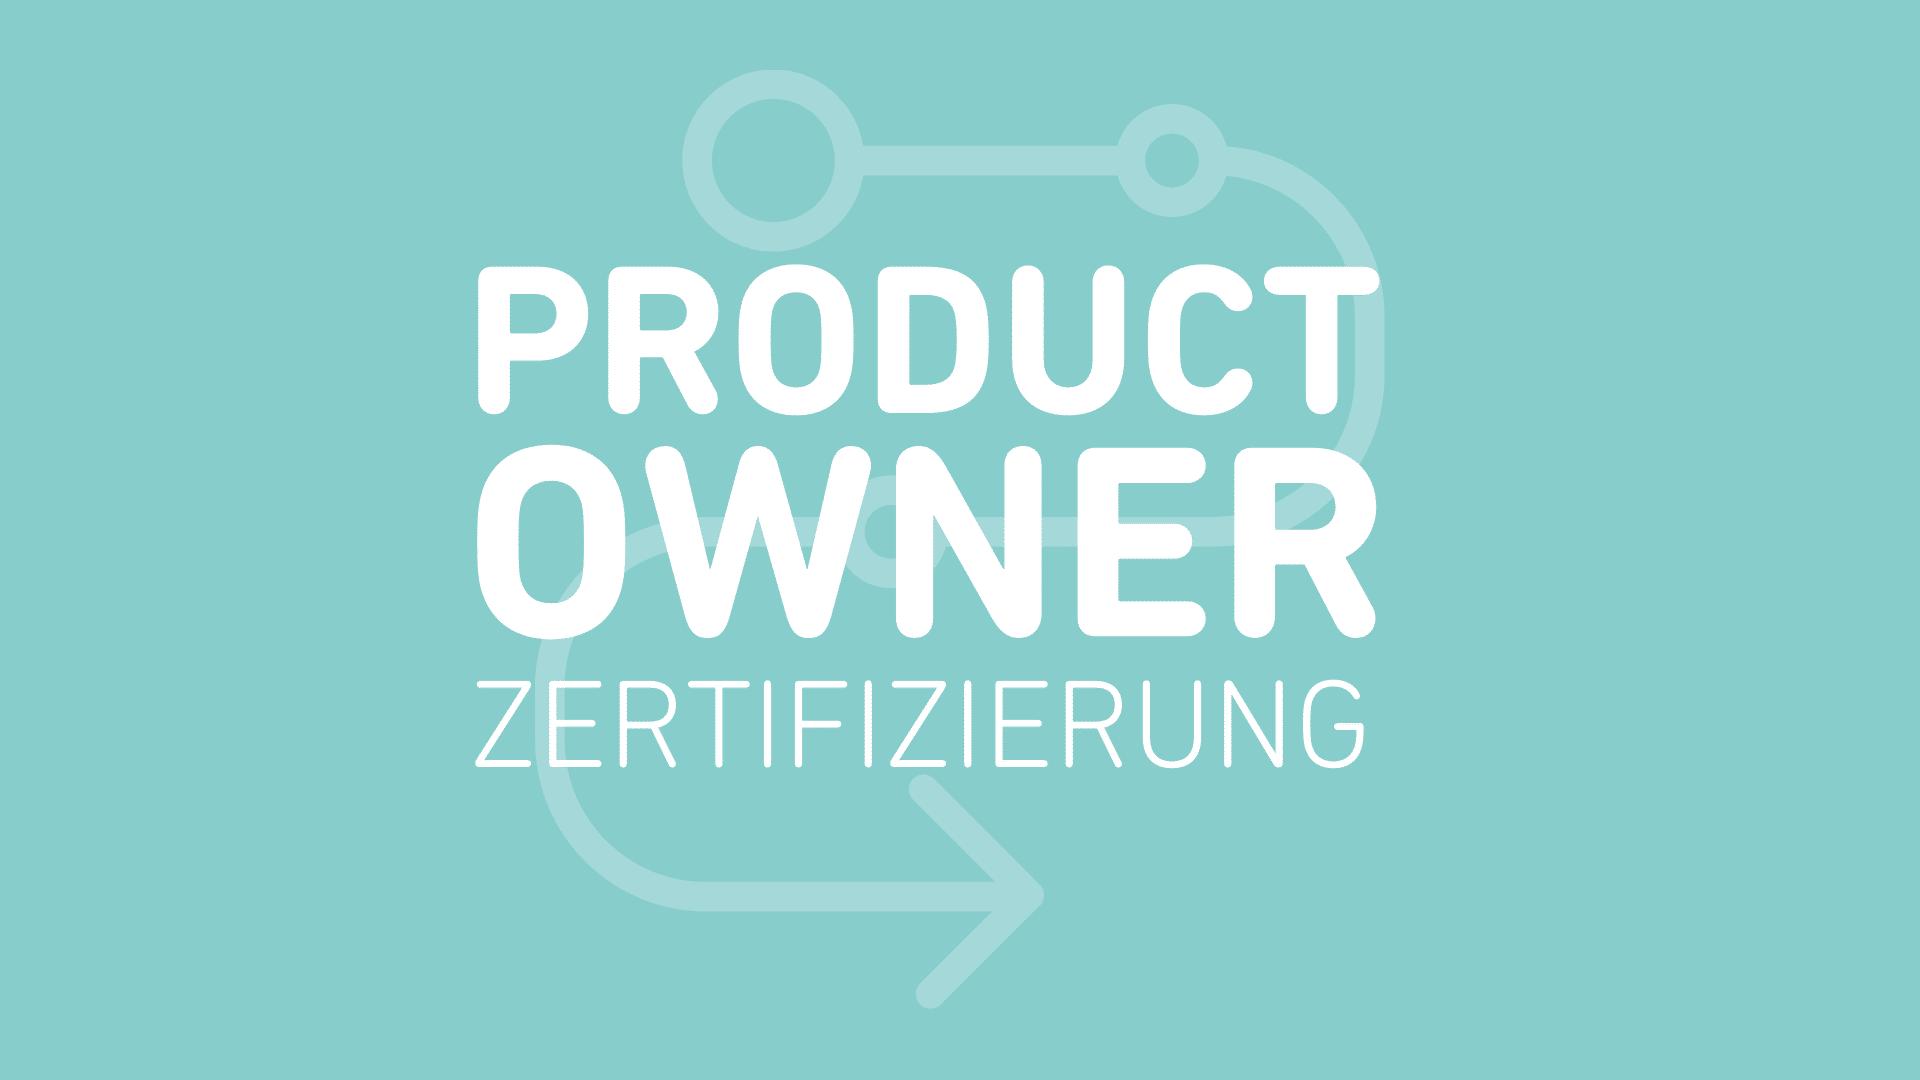 Product-Owner-Zertifizierung